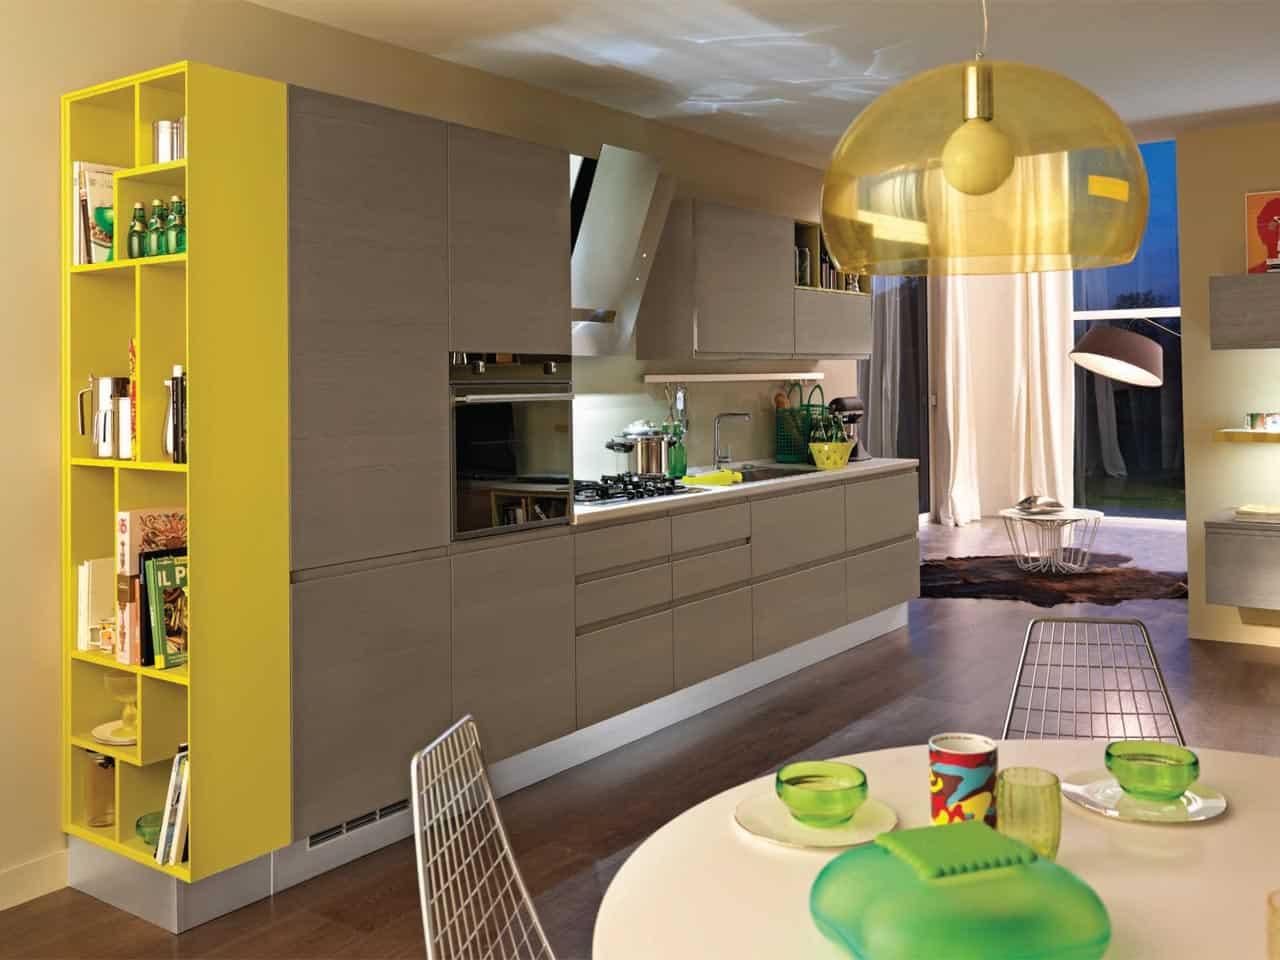 Mobili Stile Country Ikea : Cucine stile country ikea best ikea metod cucina photos